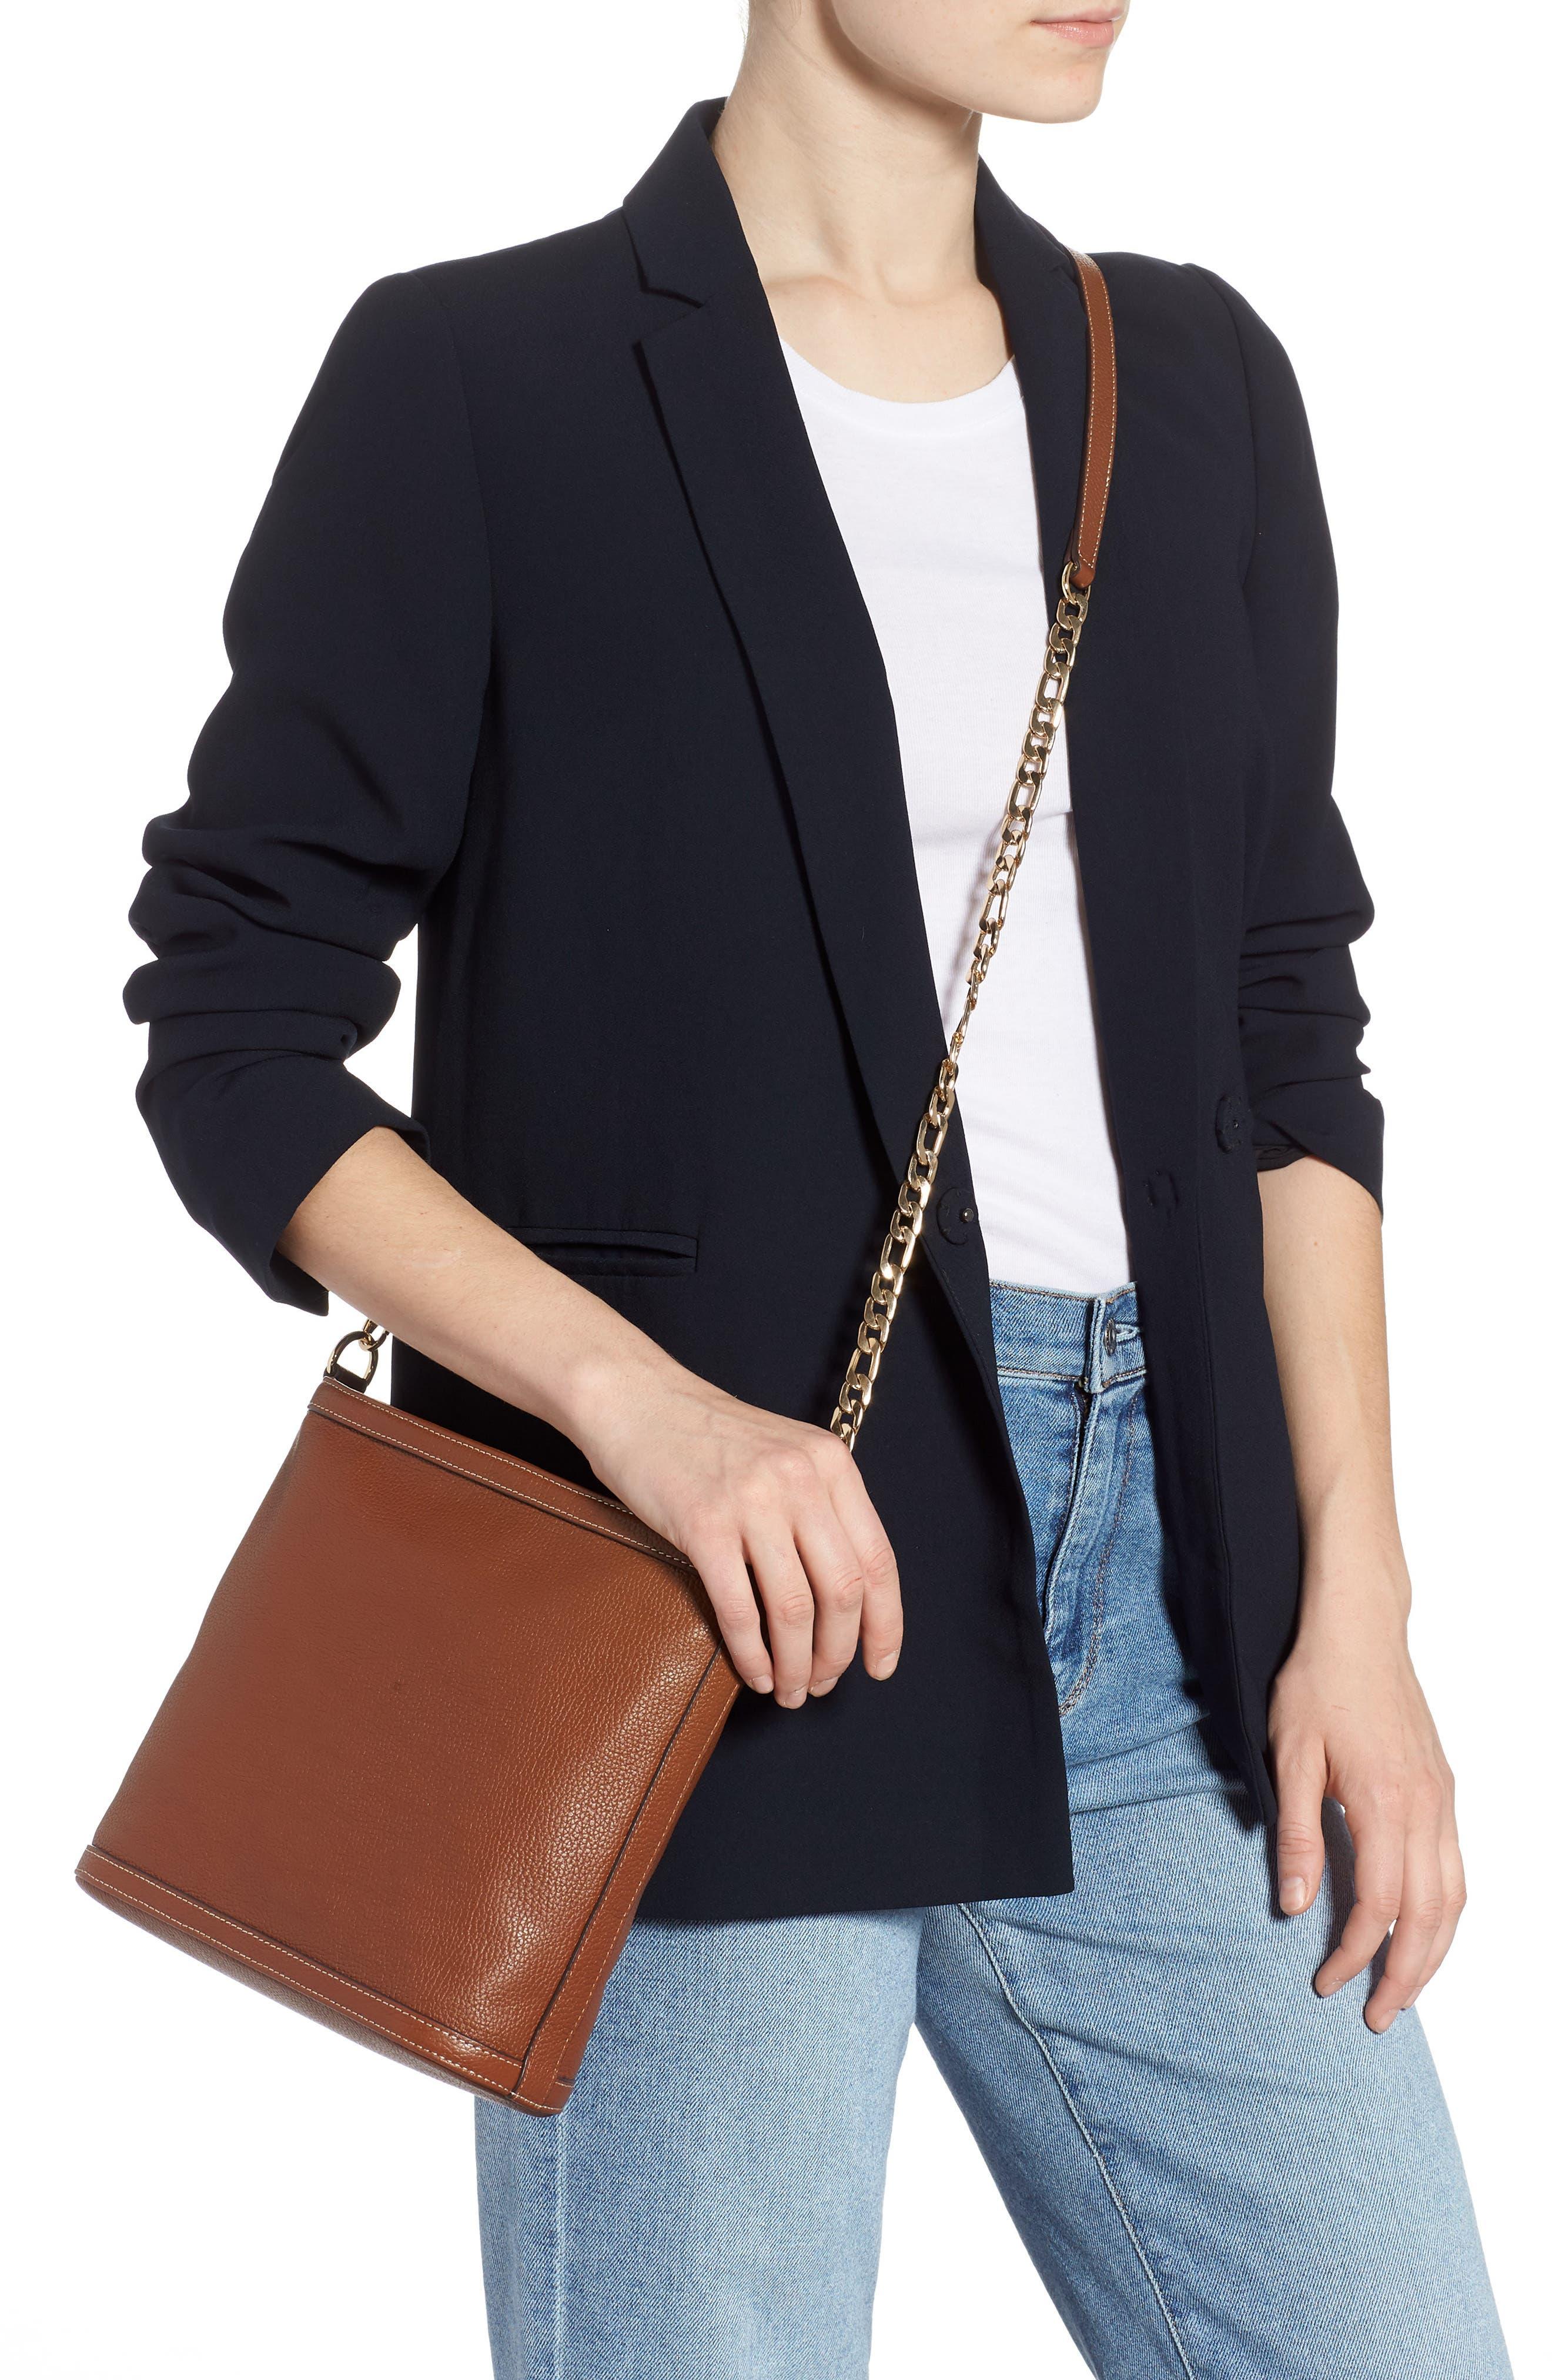 NORDSTROM,                             Maribel Leather Crossbody Bag,                             Alternate thumbnail 2, color,                             BROWN AZTEC